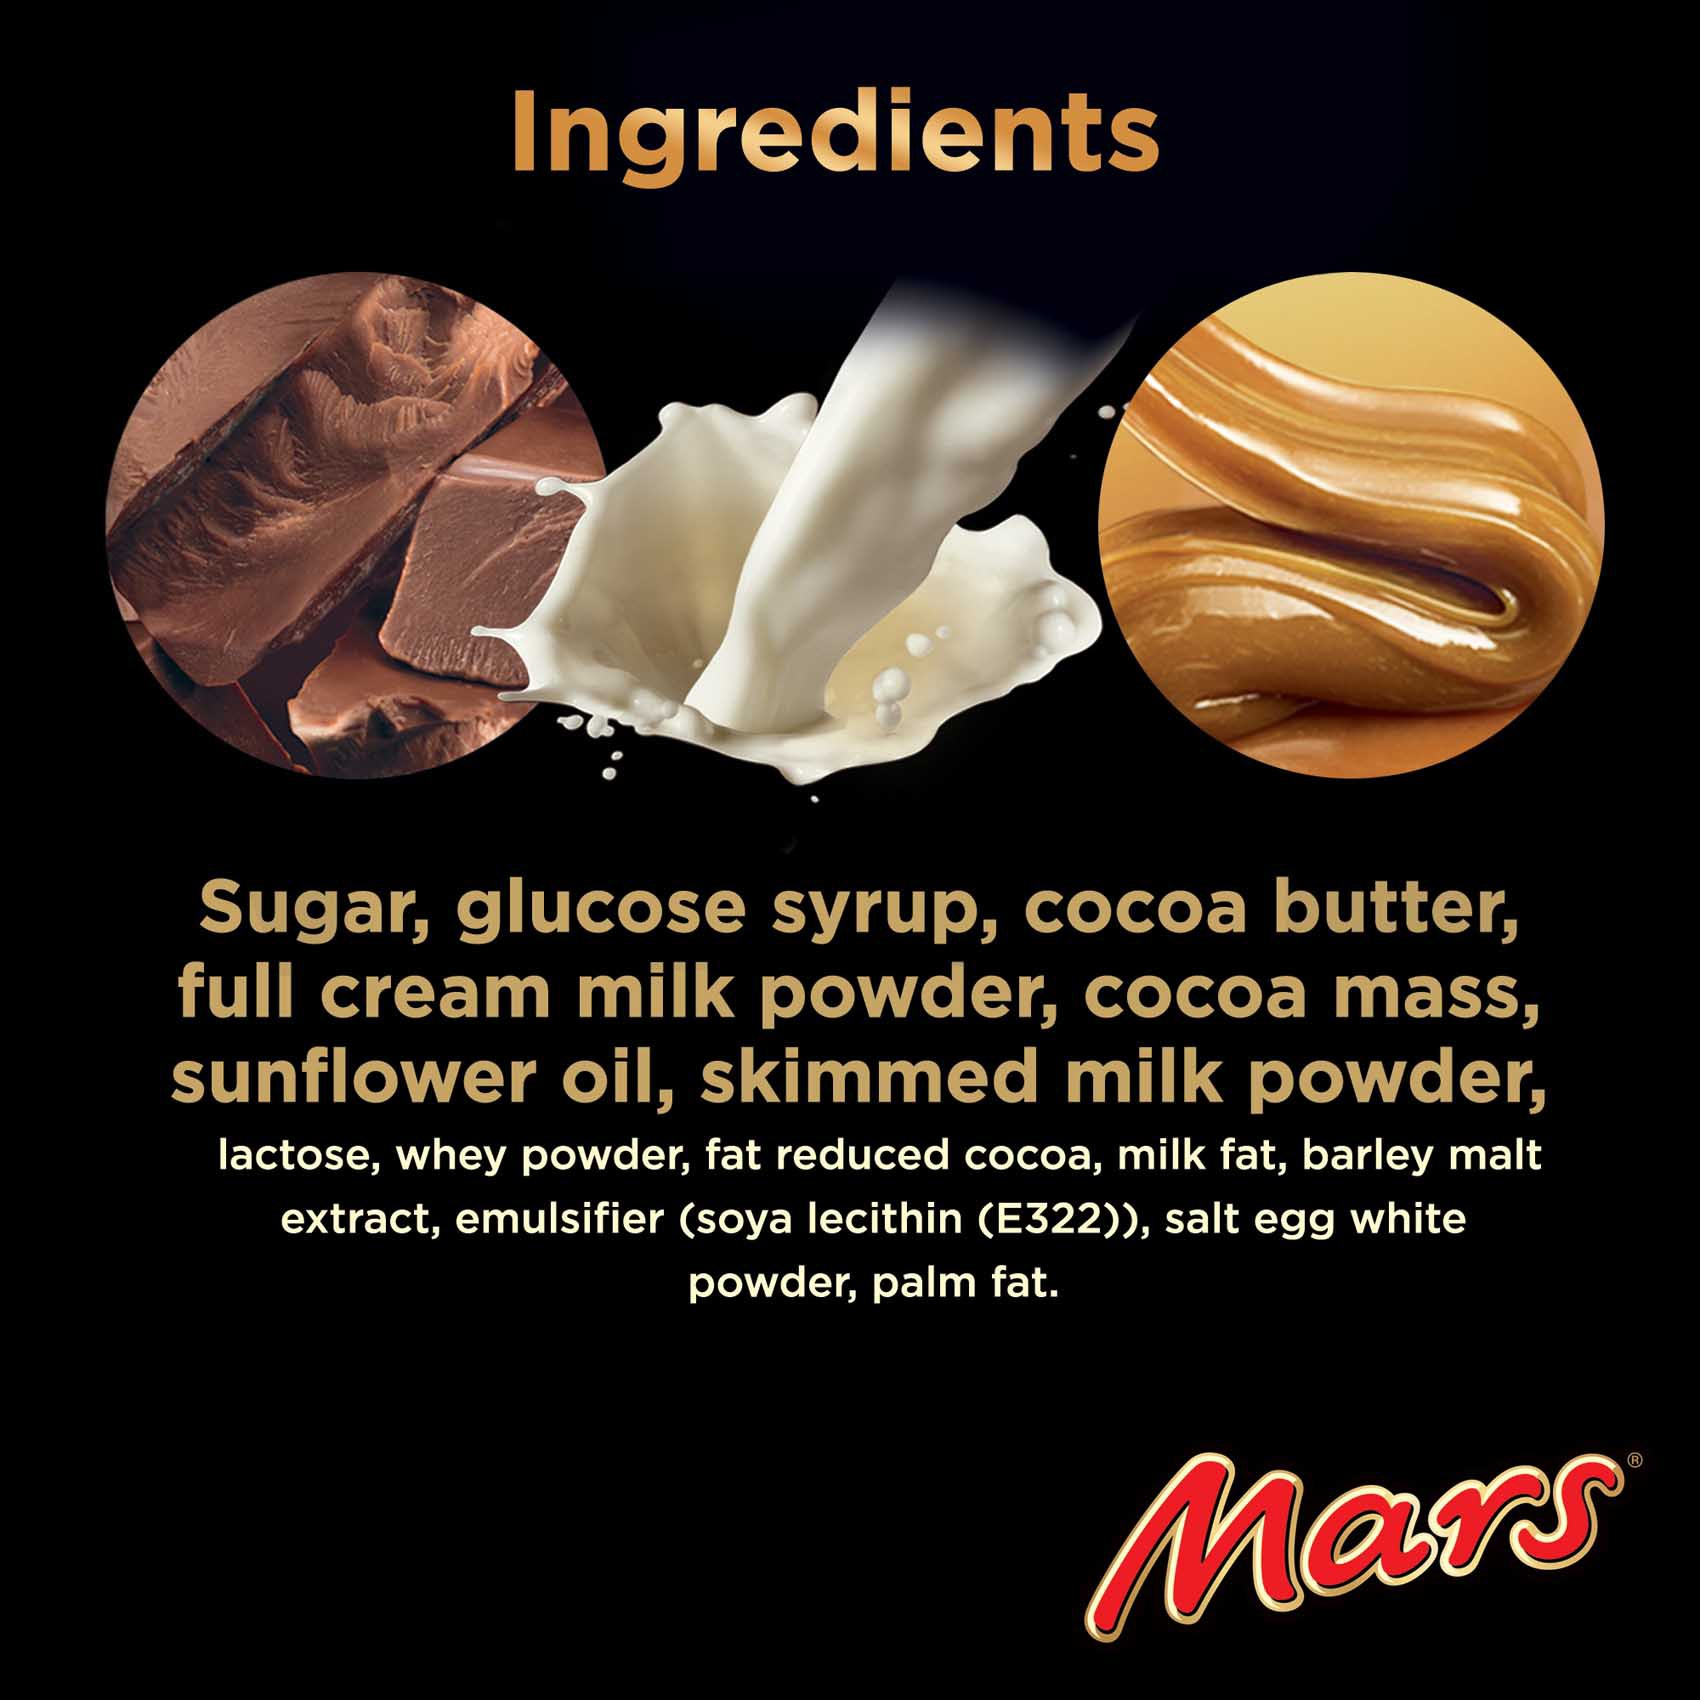 MARS MINIATURES 150GR